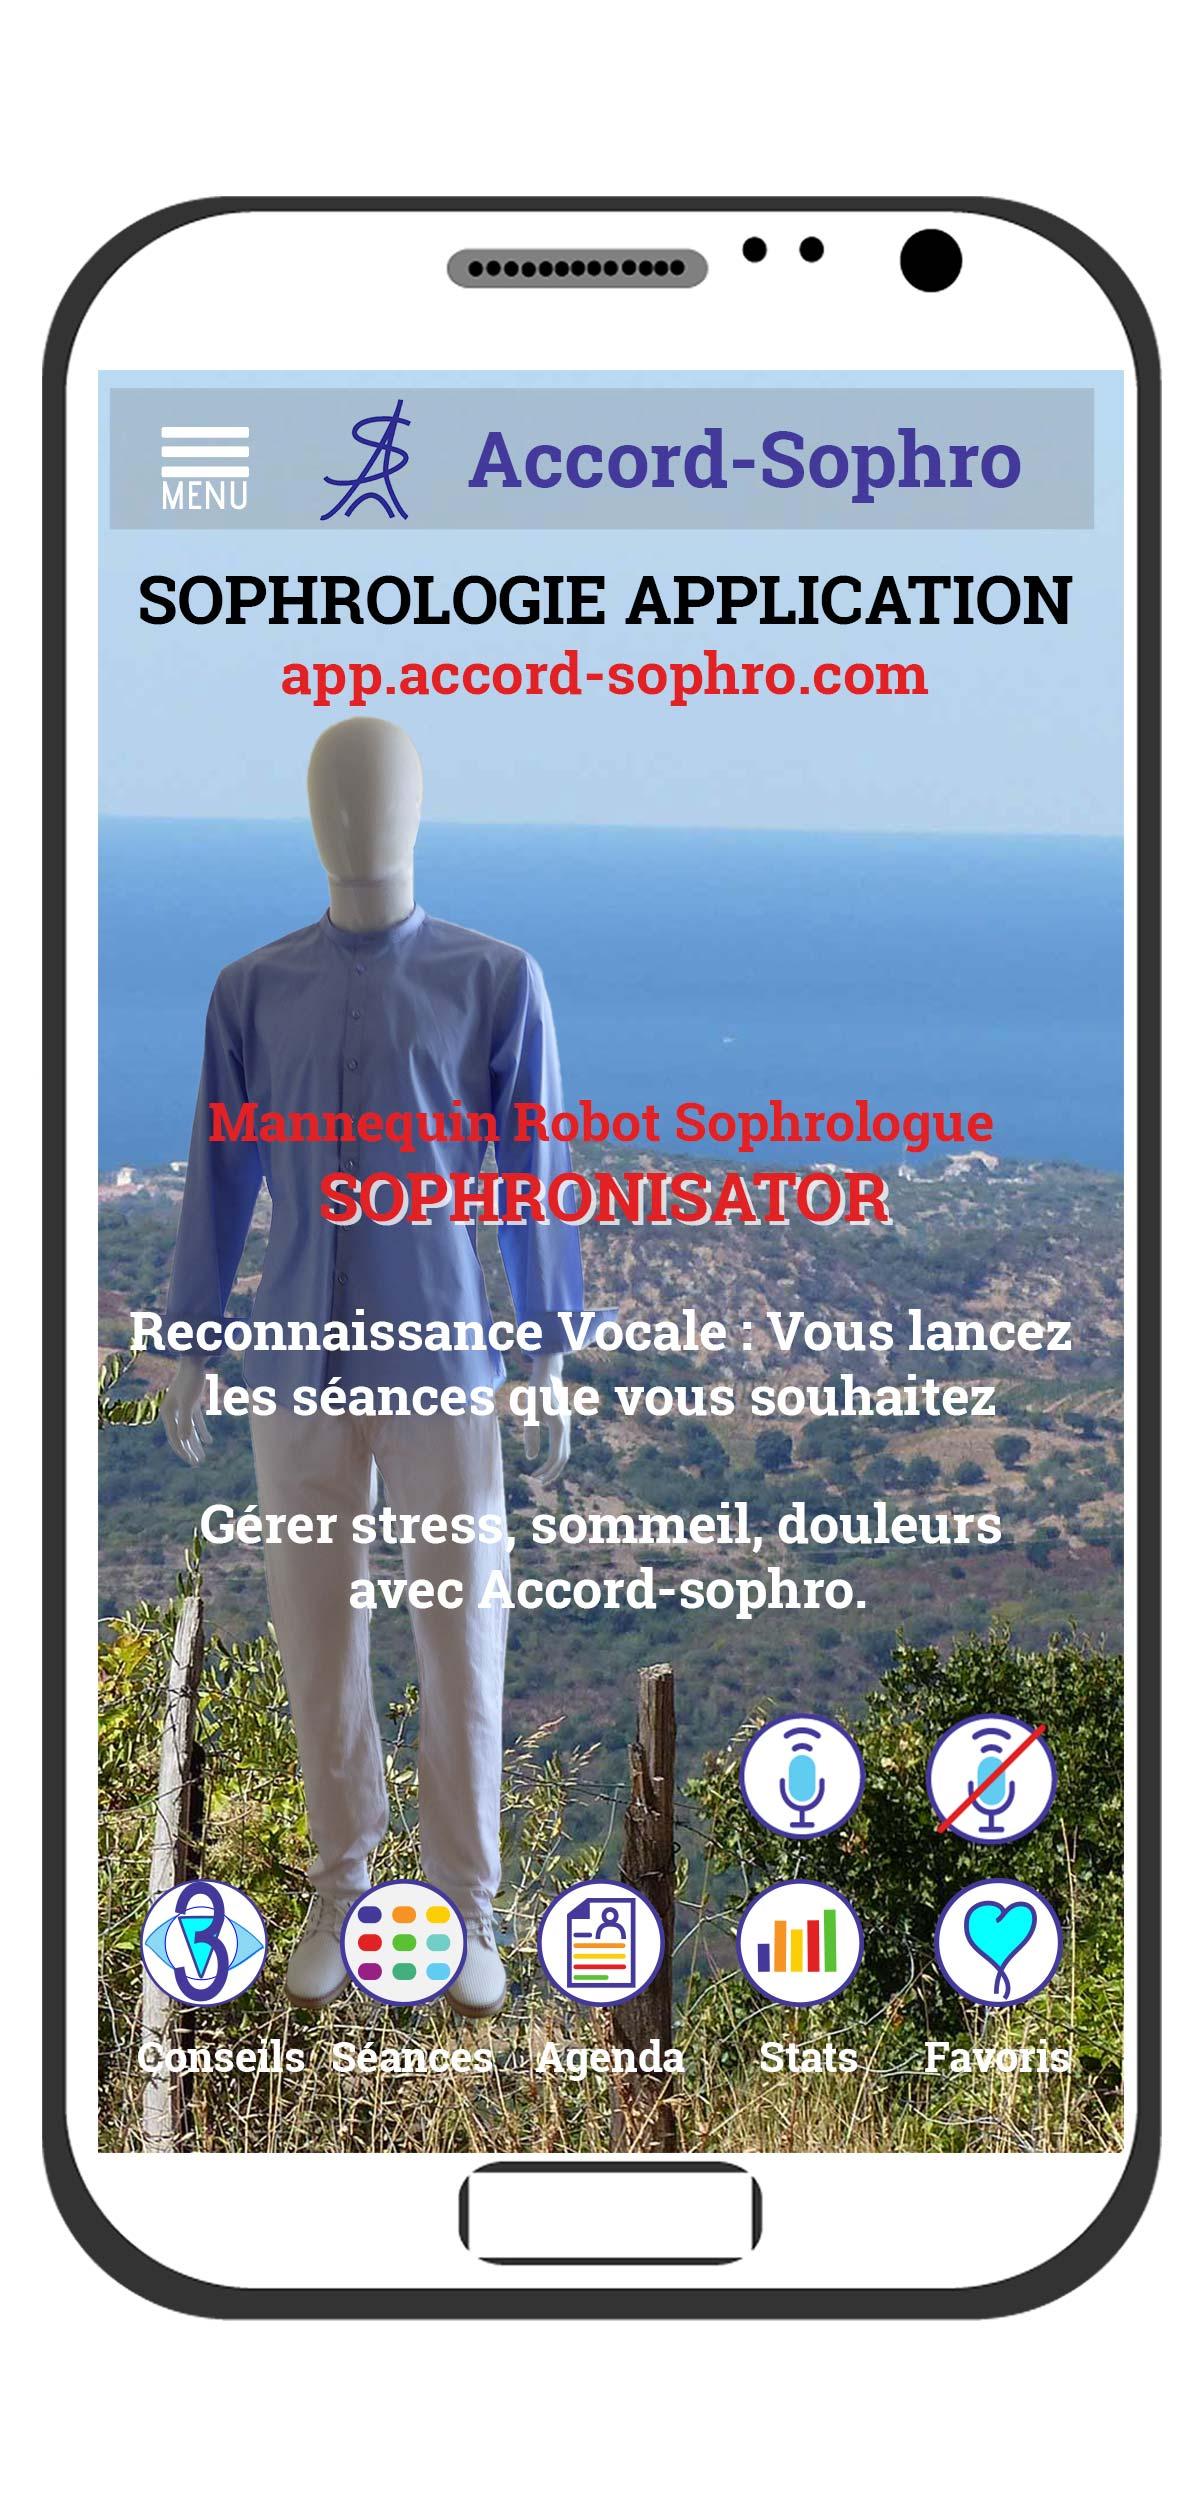 sophronisator, présentation au salon healcare du premier mannequin qui parle en sophrologie